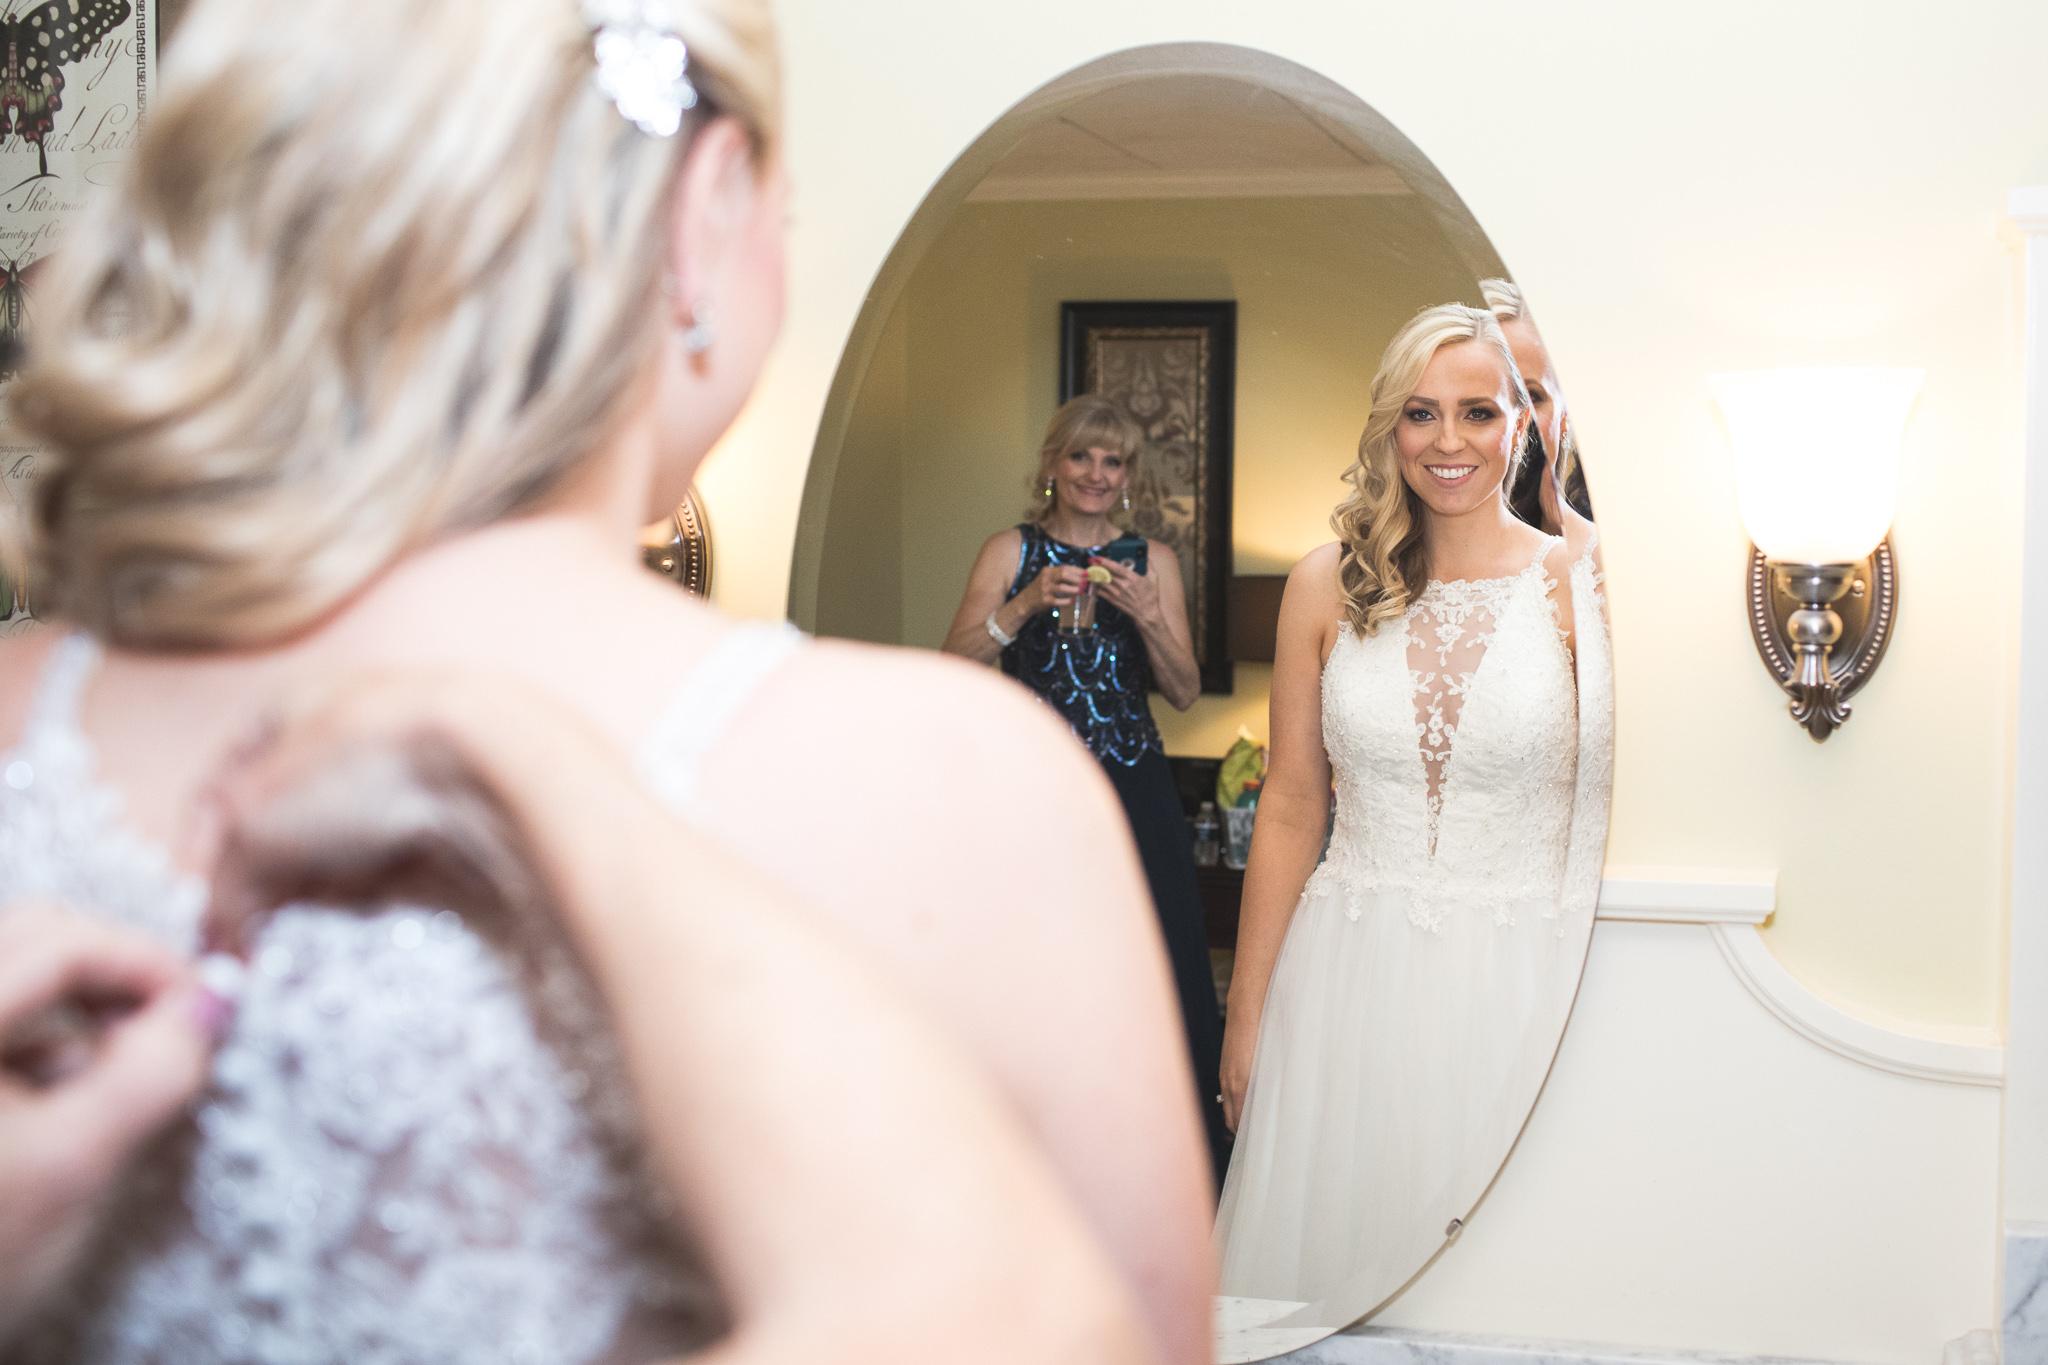 016-best-detroit-michigan-outdoor-wedding-photographer.jpg